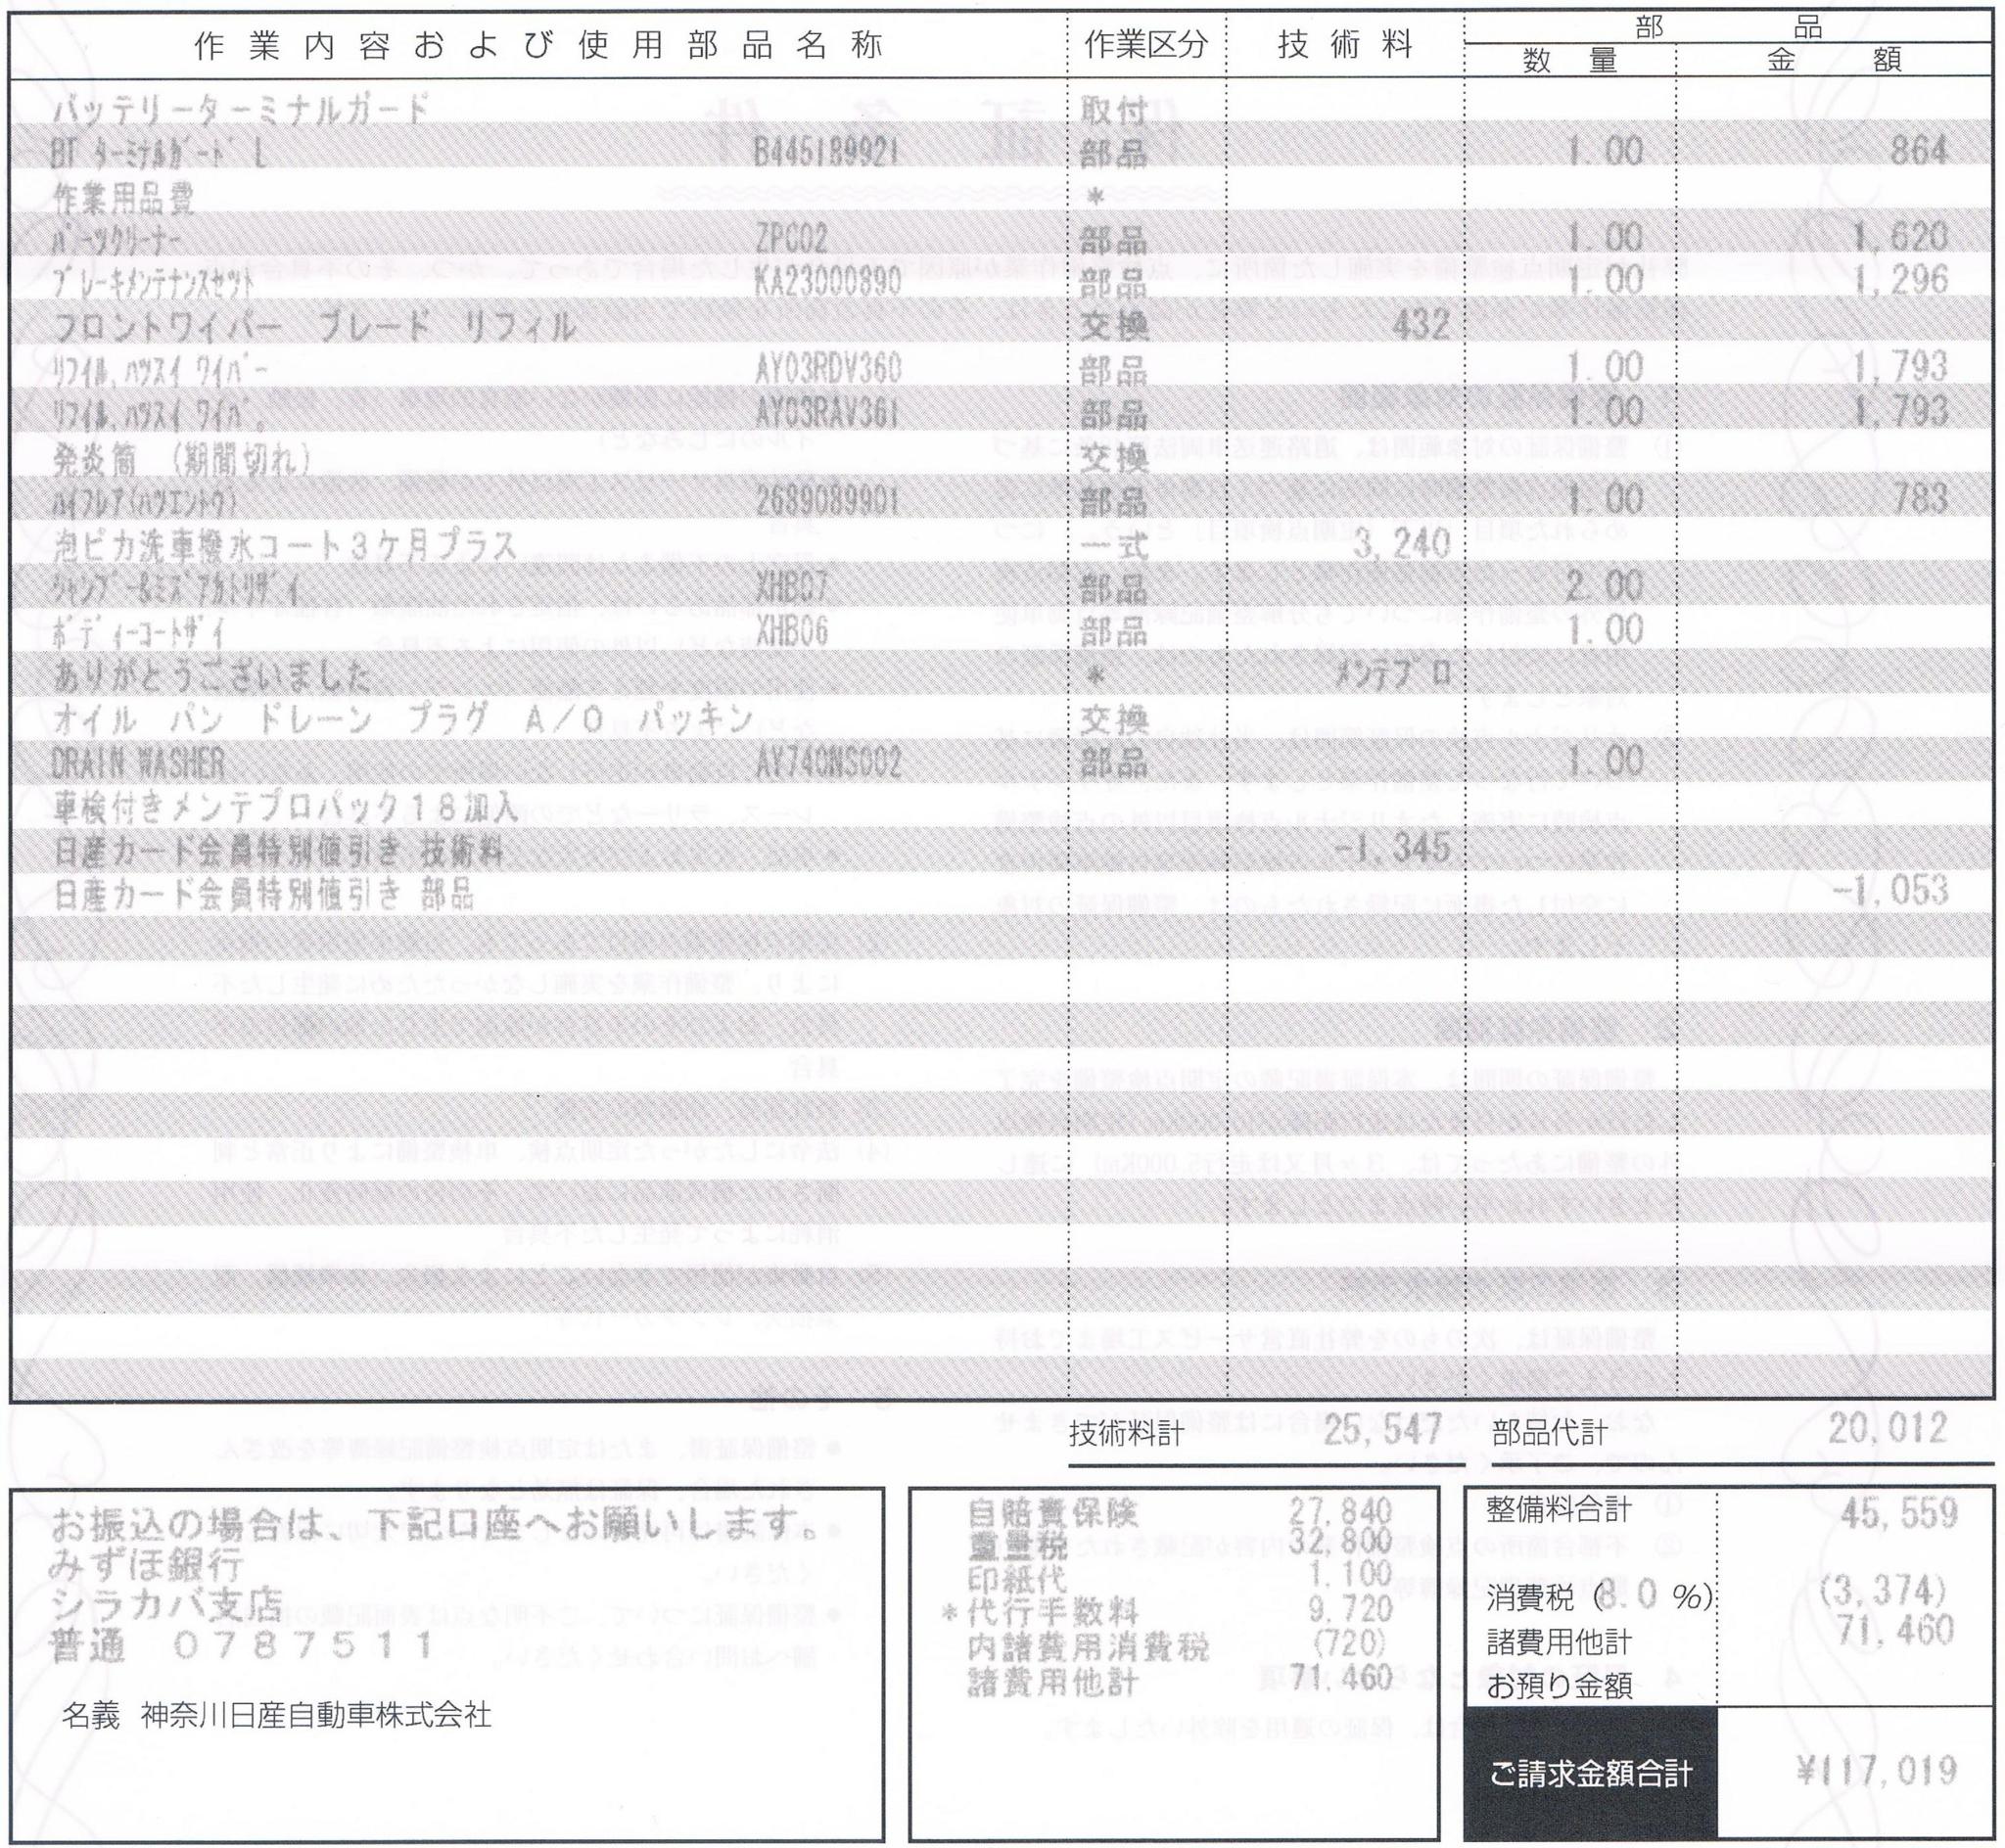 f:id:ToshUeno:20161017000000j:plain